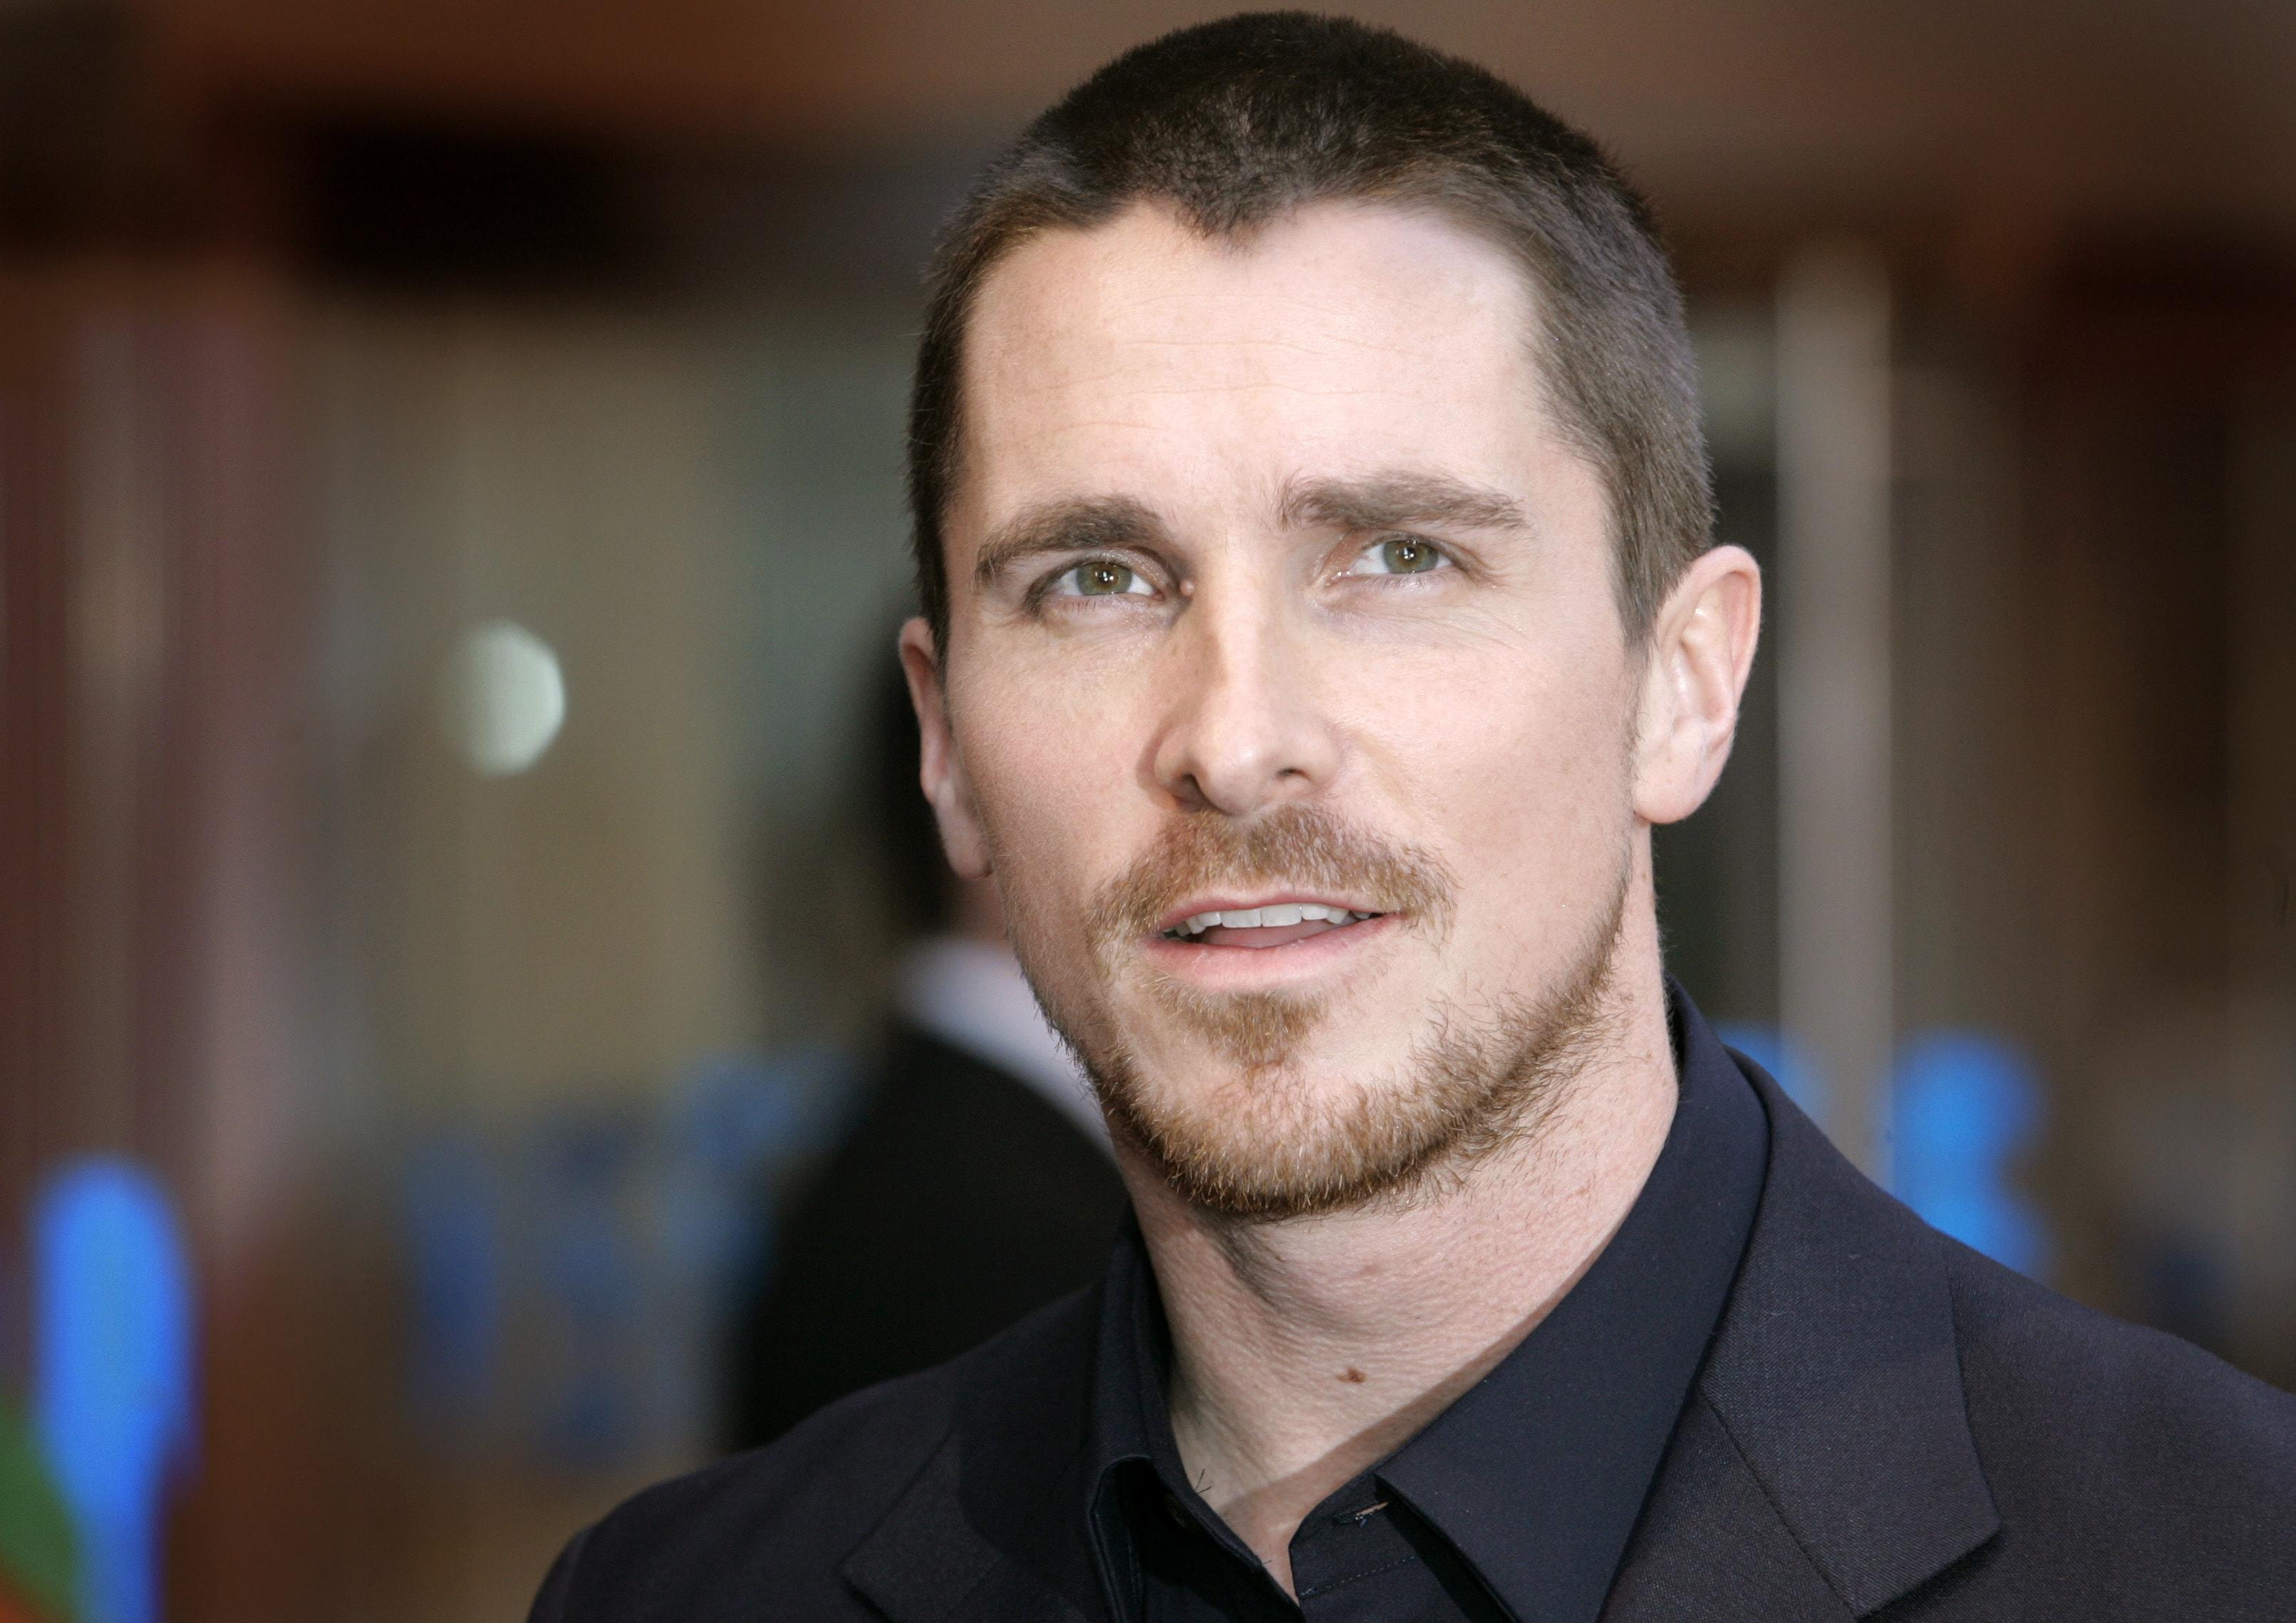 Phenomenal Christian Bale Hd Desktop Wallpapers 7Wallpapers Net Short Hairstyles For Black Women Fulllsitofus